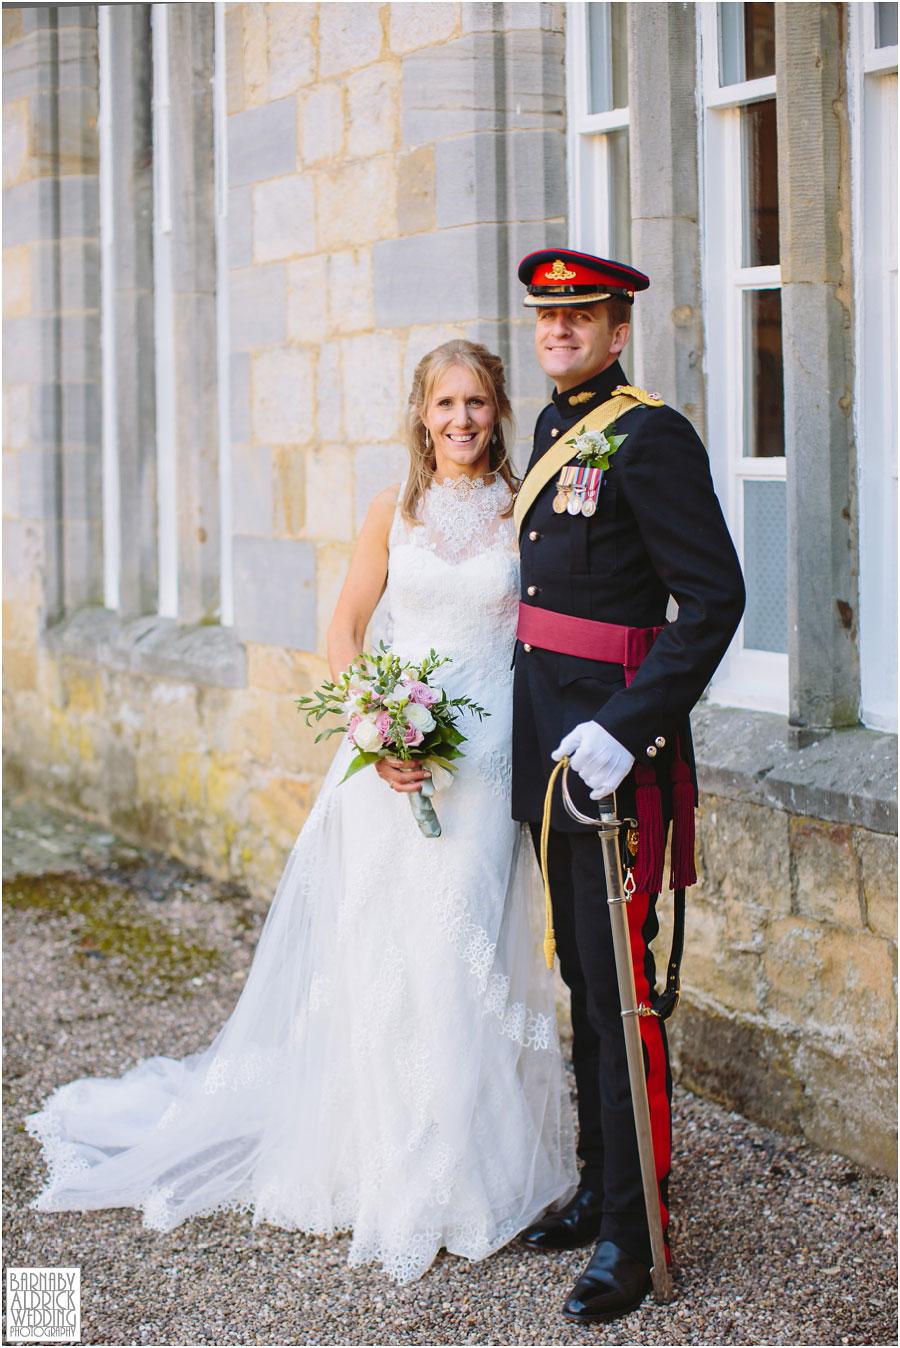 Newburgh Priory Yorkshire Wedding Photography 037.jpg